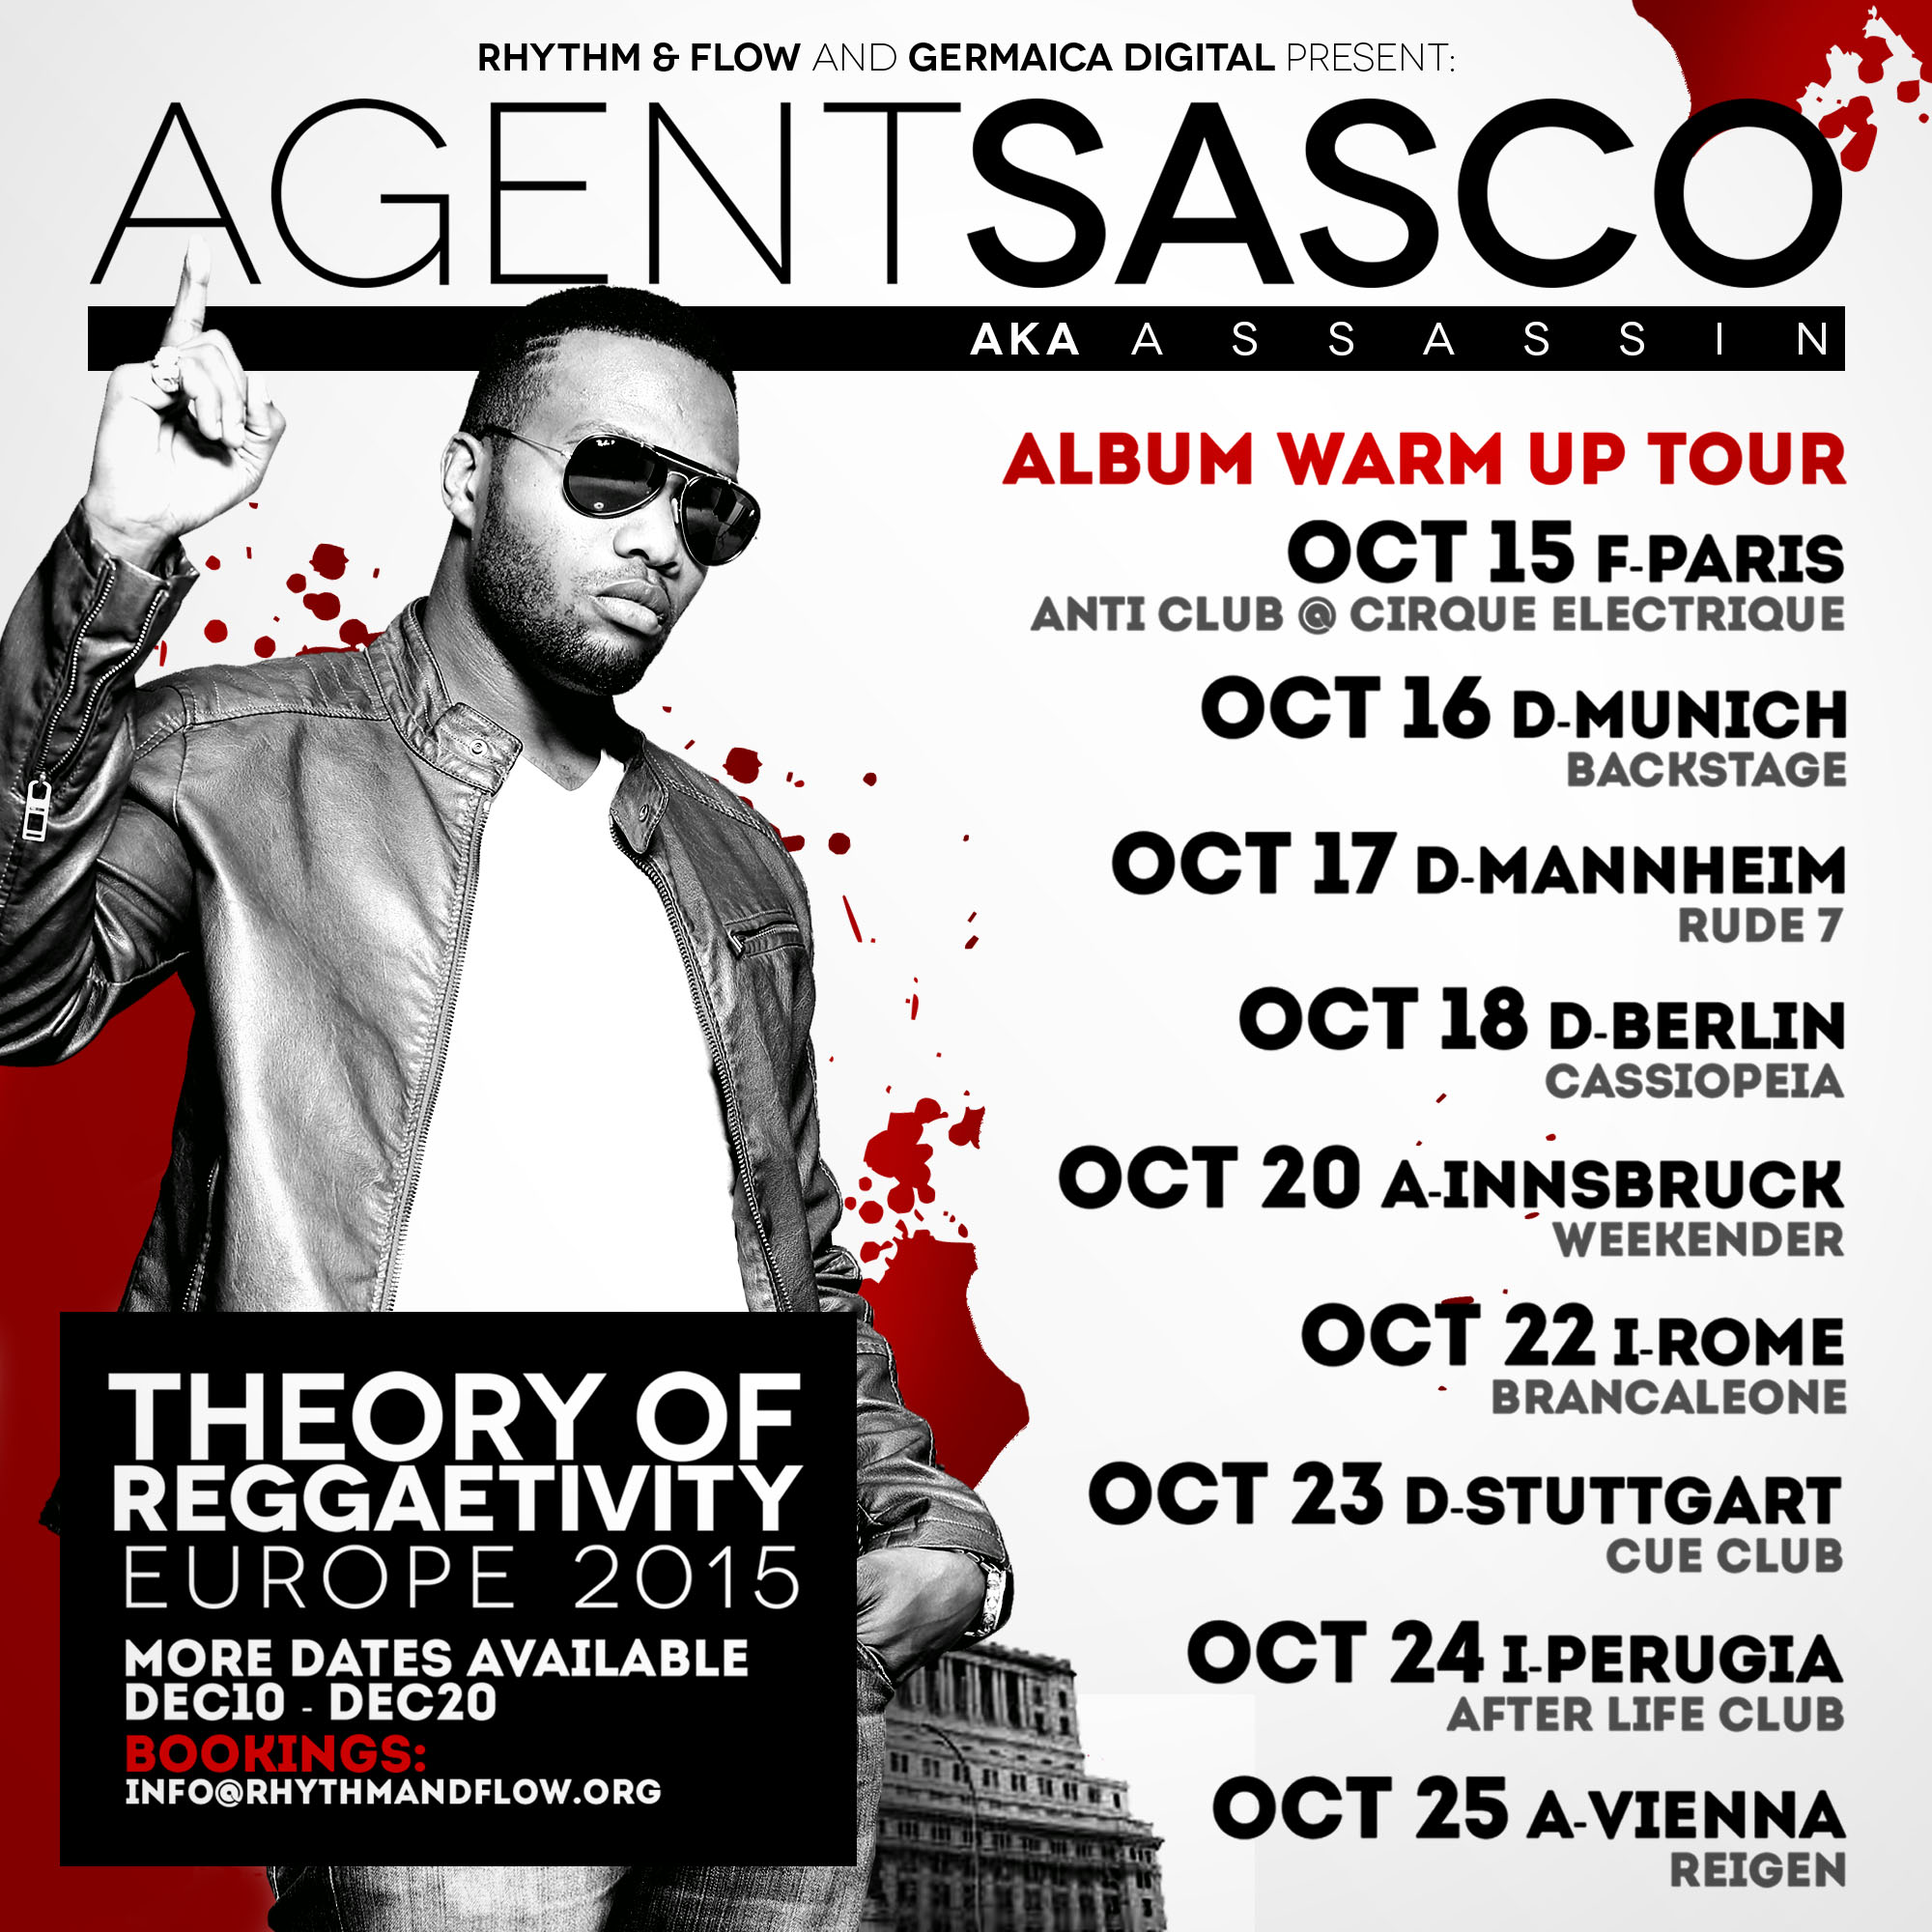 ASSASSIN AKA AGENT SASCO – THEORY OF REGGAETIVITY ALBUM WARM